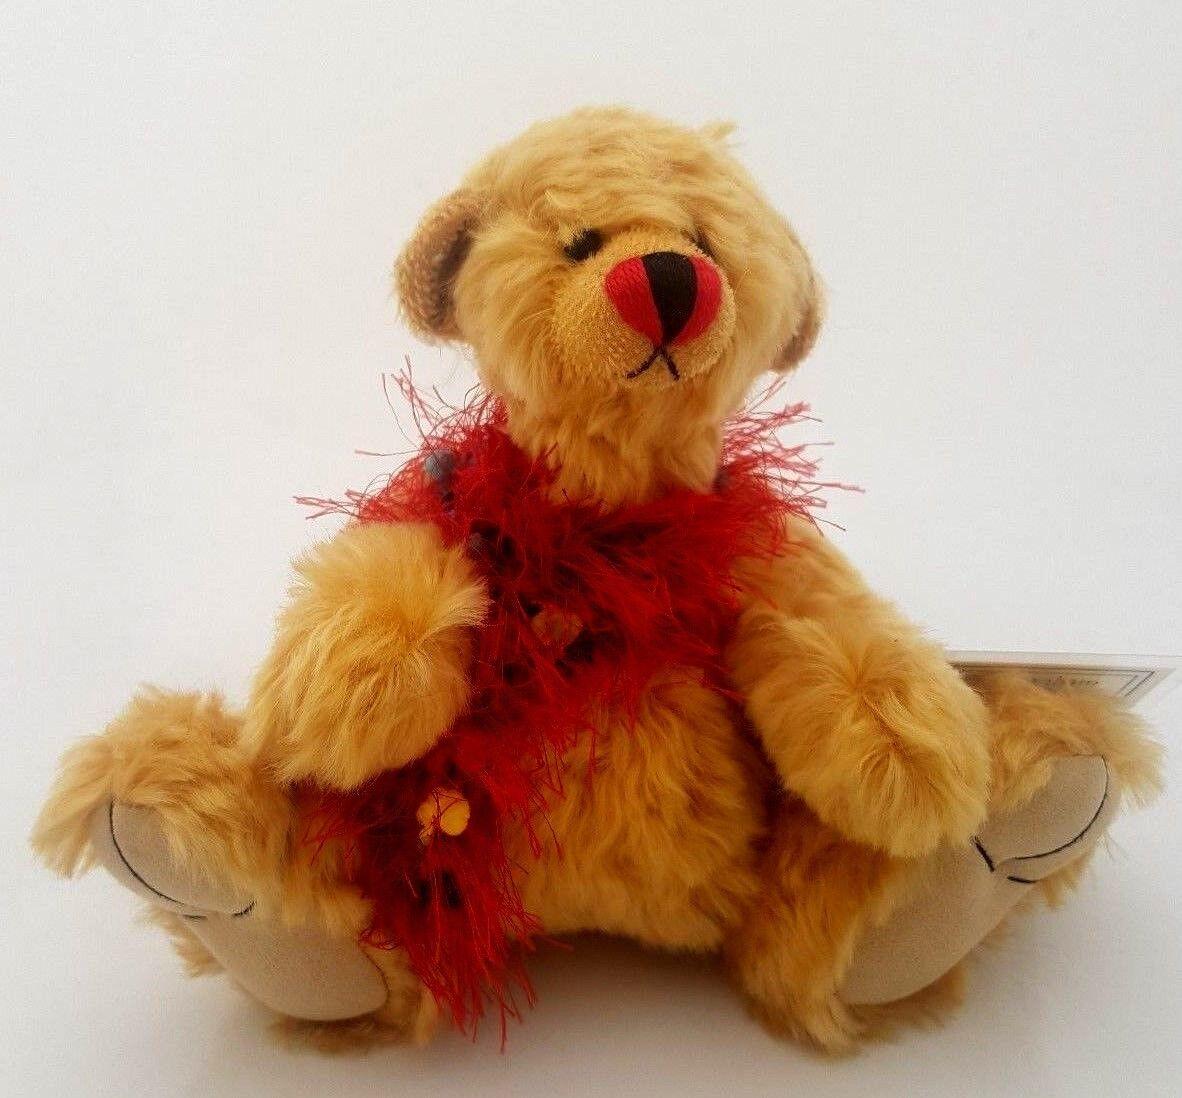 Teddy Bears Deb Canham * Flossie-LTD ED: 36 * RARA-IN PENSIONE